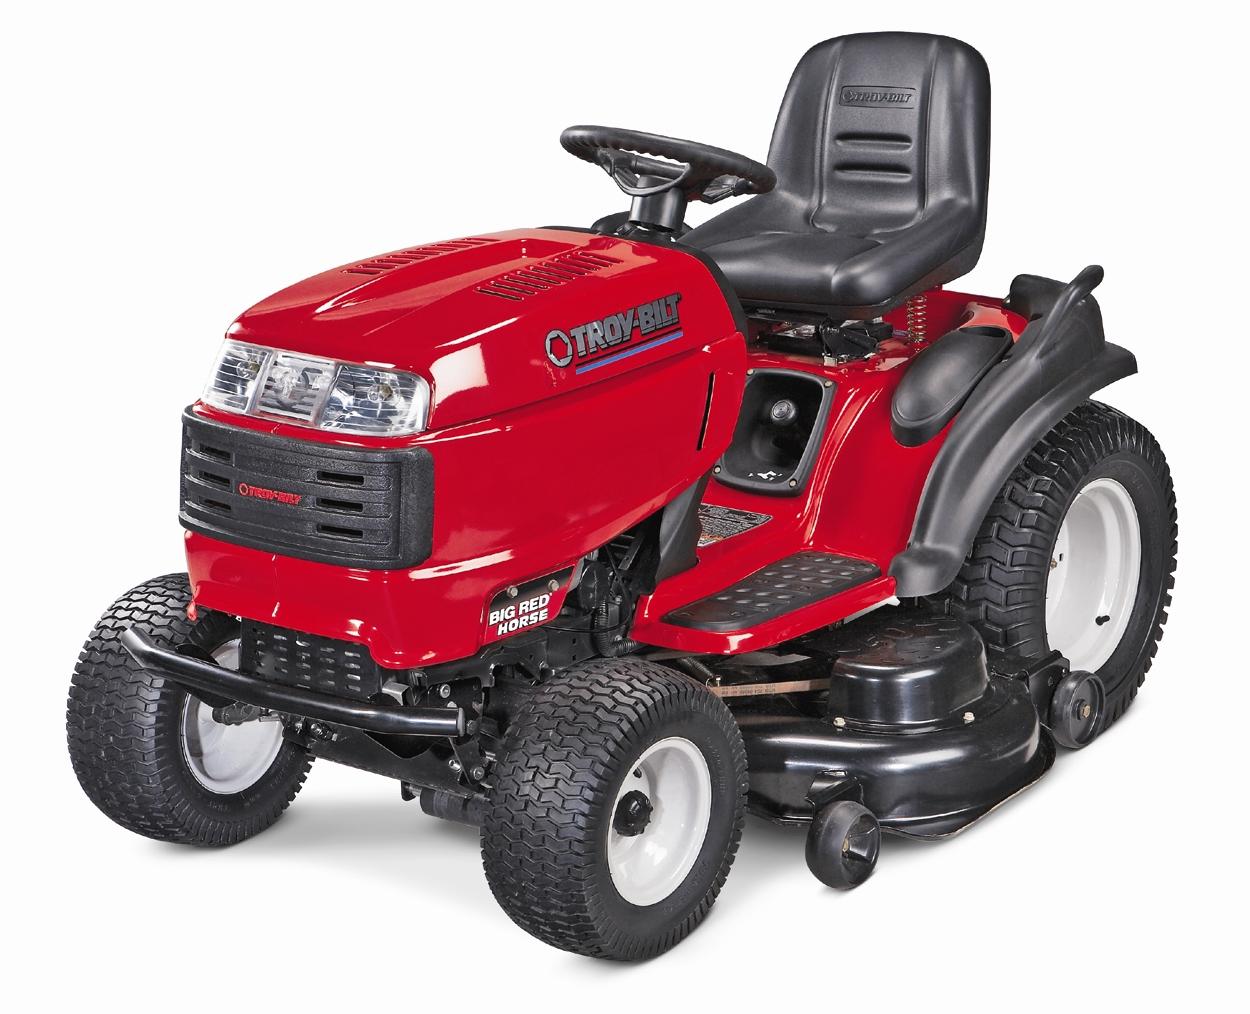 hight resolution of troy bilt garden tractor